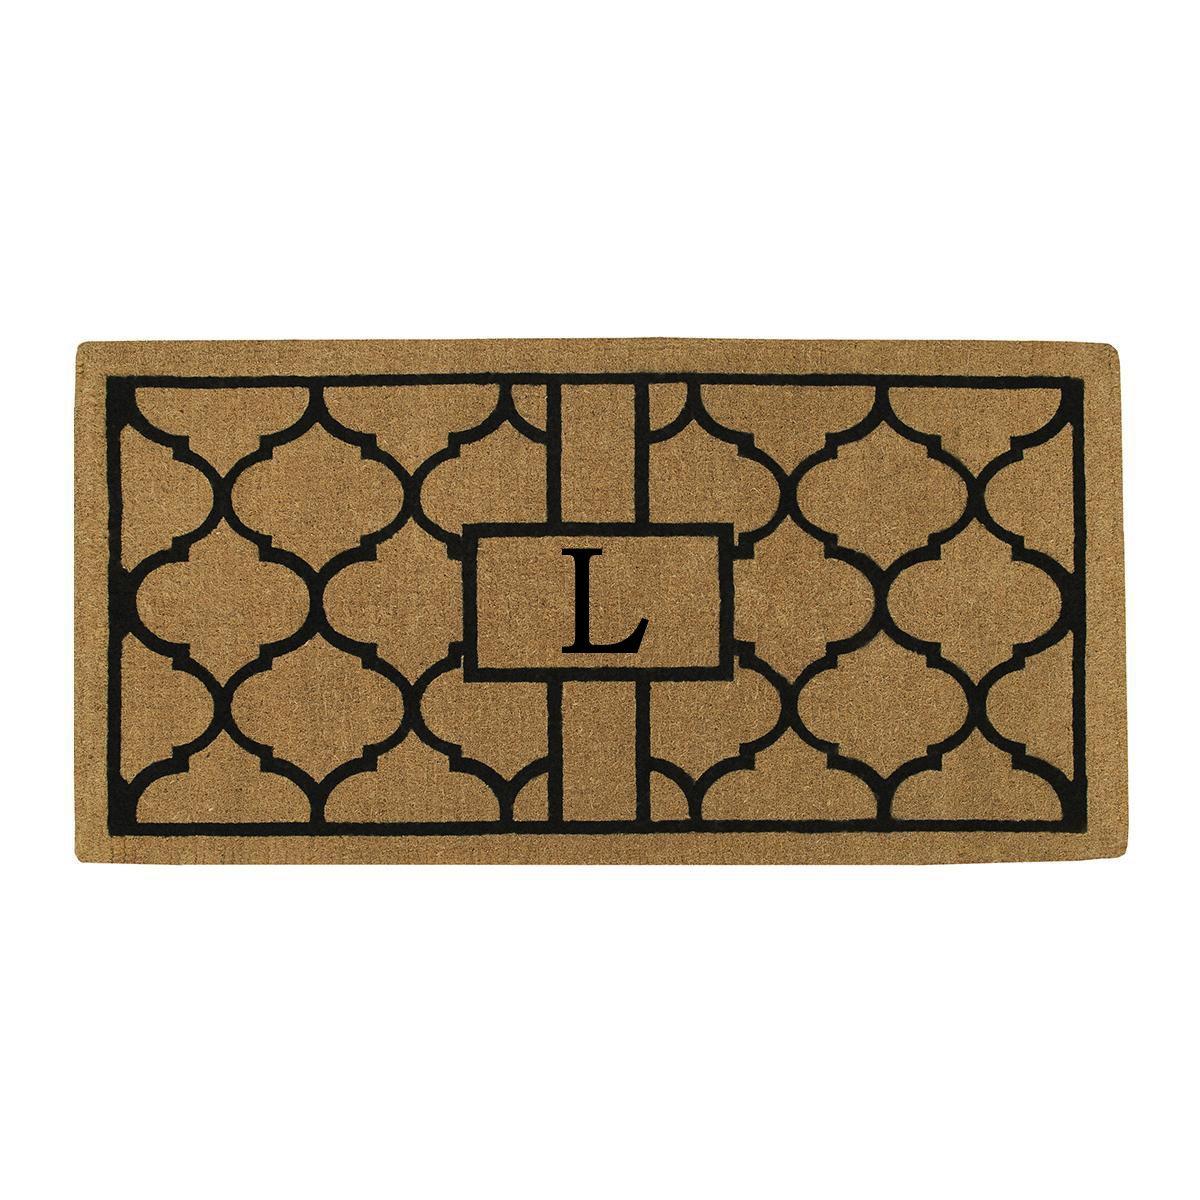 Home & More 180083672L Pantera Extra-thick Doormat, 36'' x 72'' x 1.50'', Monogrammed Letter L, Natural/Black